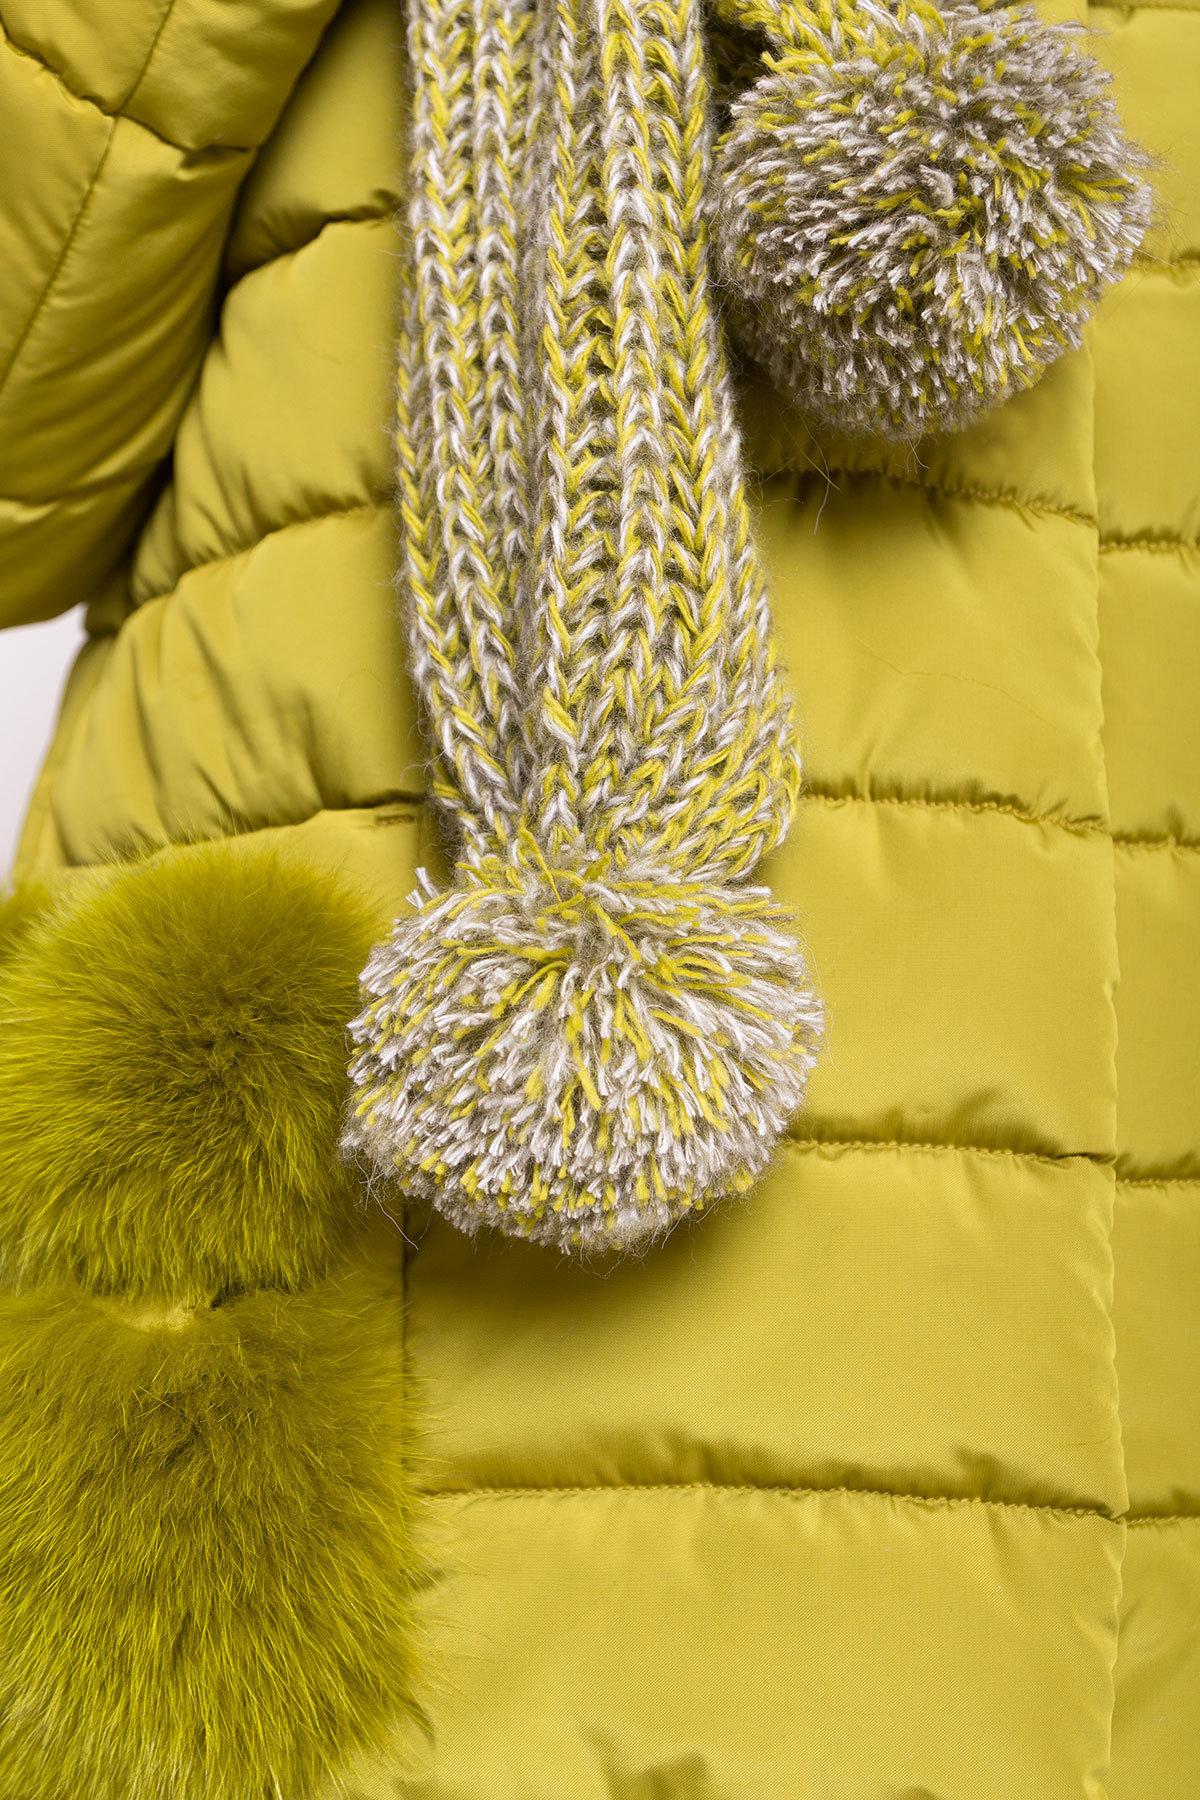 Пуховик с меховыми карманами Лили 3523 АРТ. 19152 Цвет: Олива - фото 4, интернет магазин tm-modus.ru